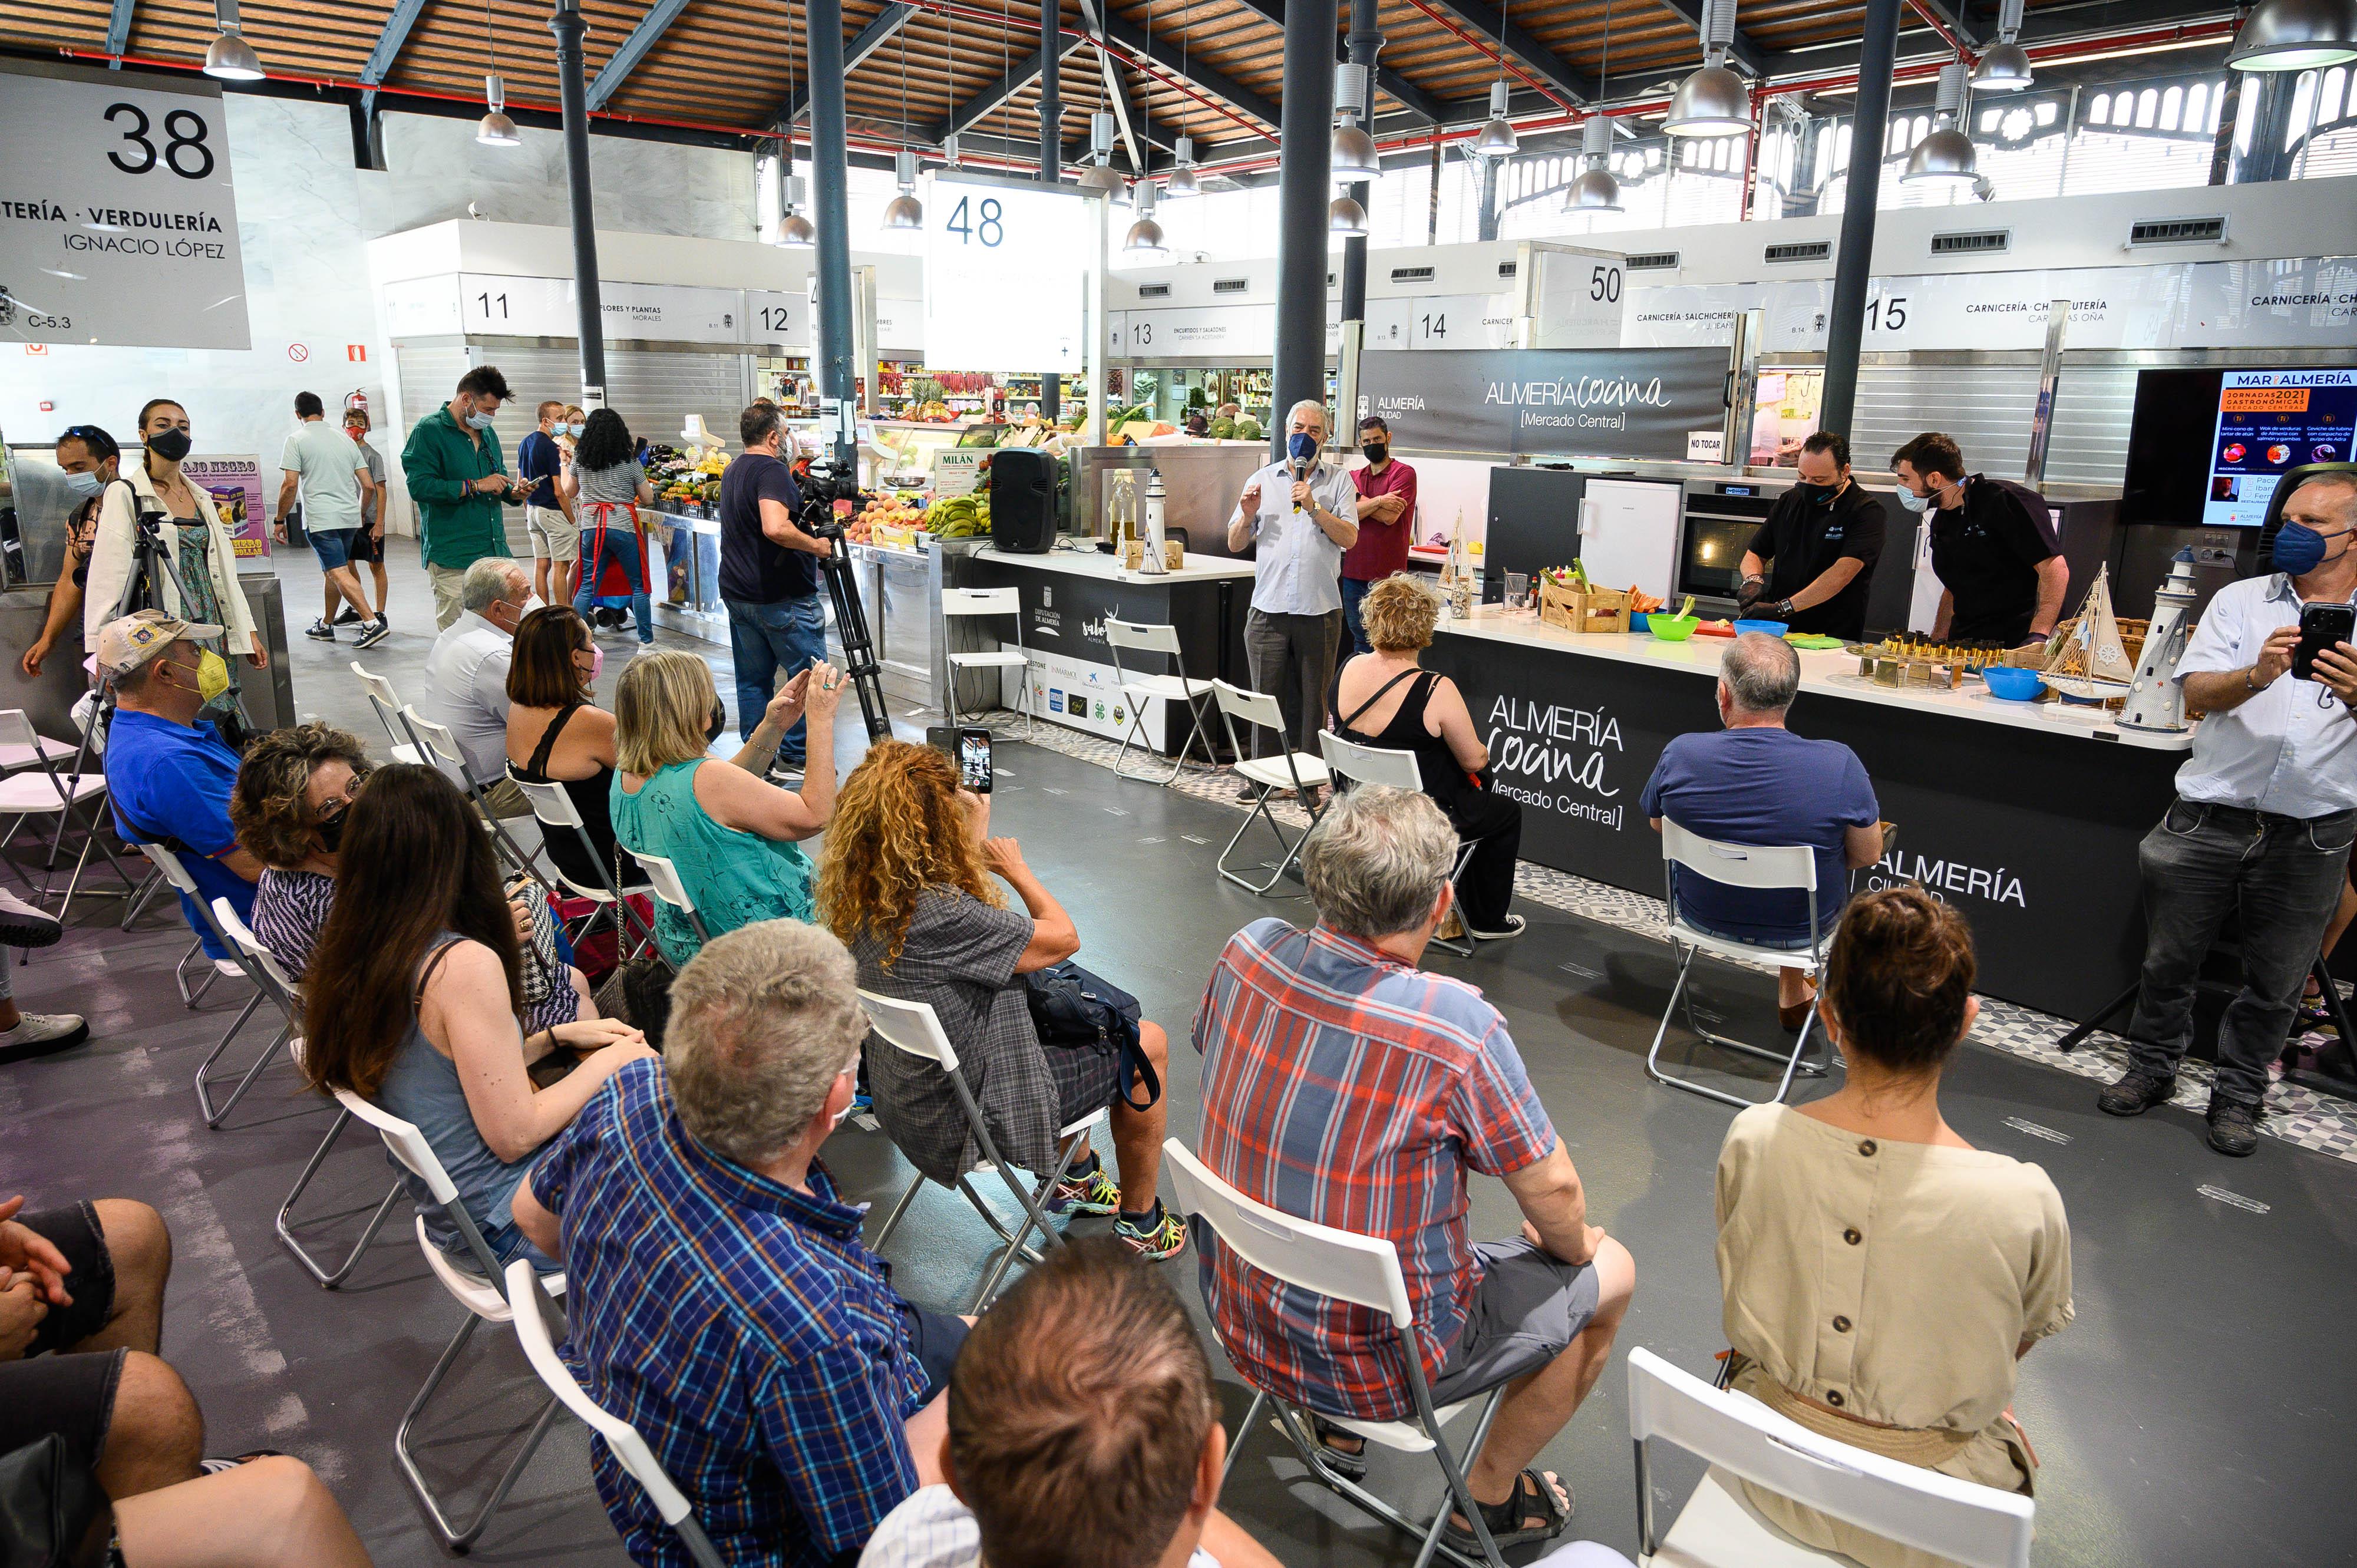 Jornadas gastronómicas mercado Almería